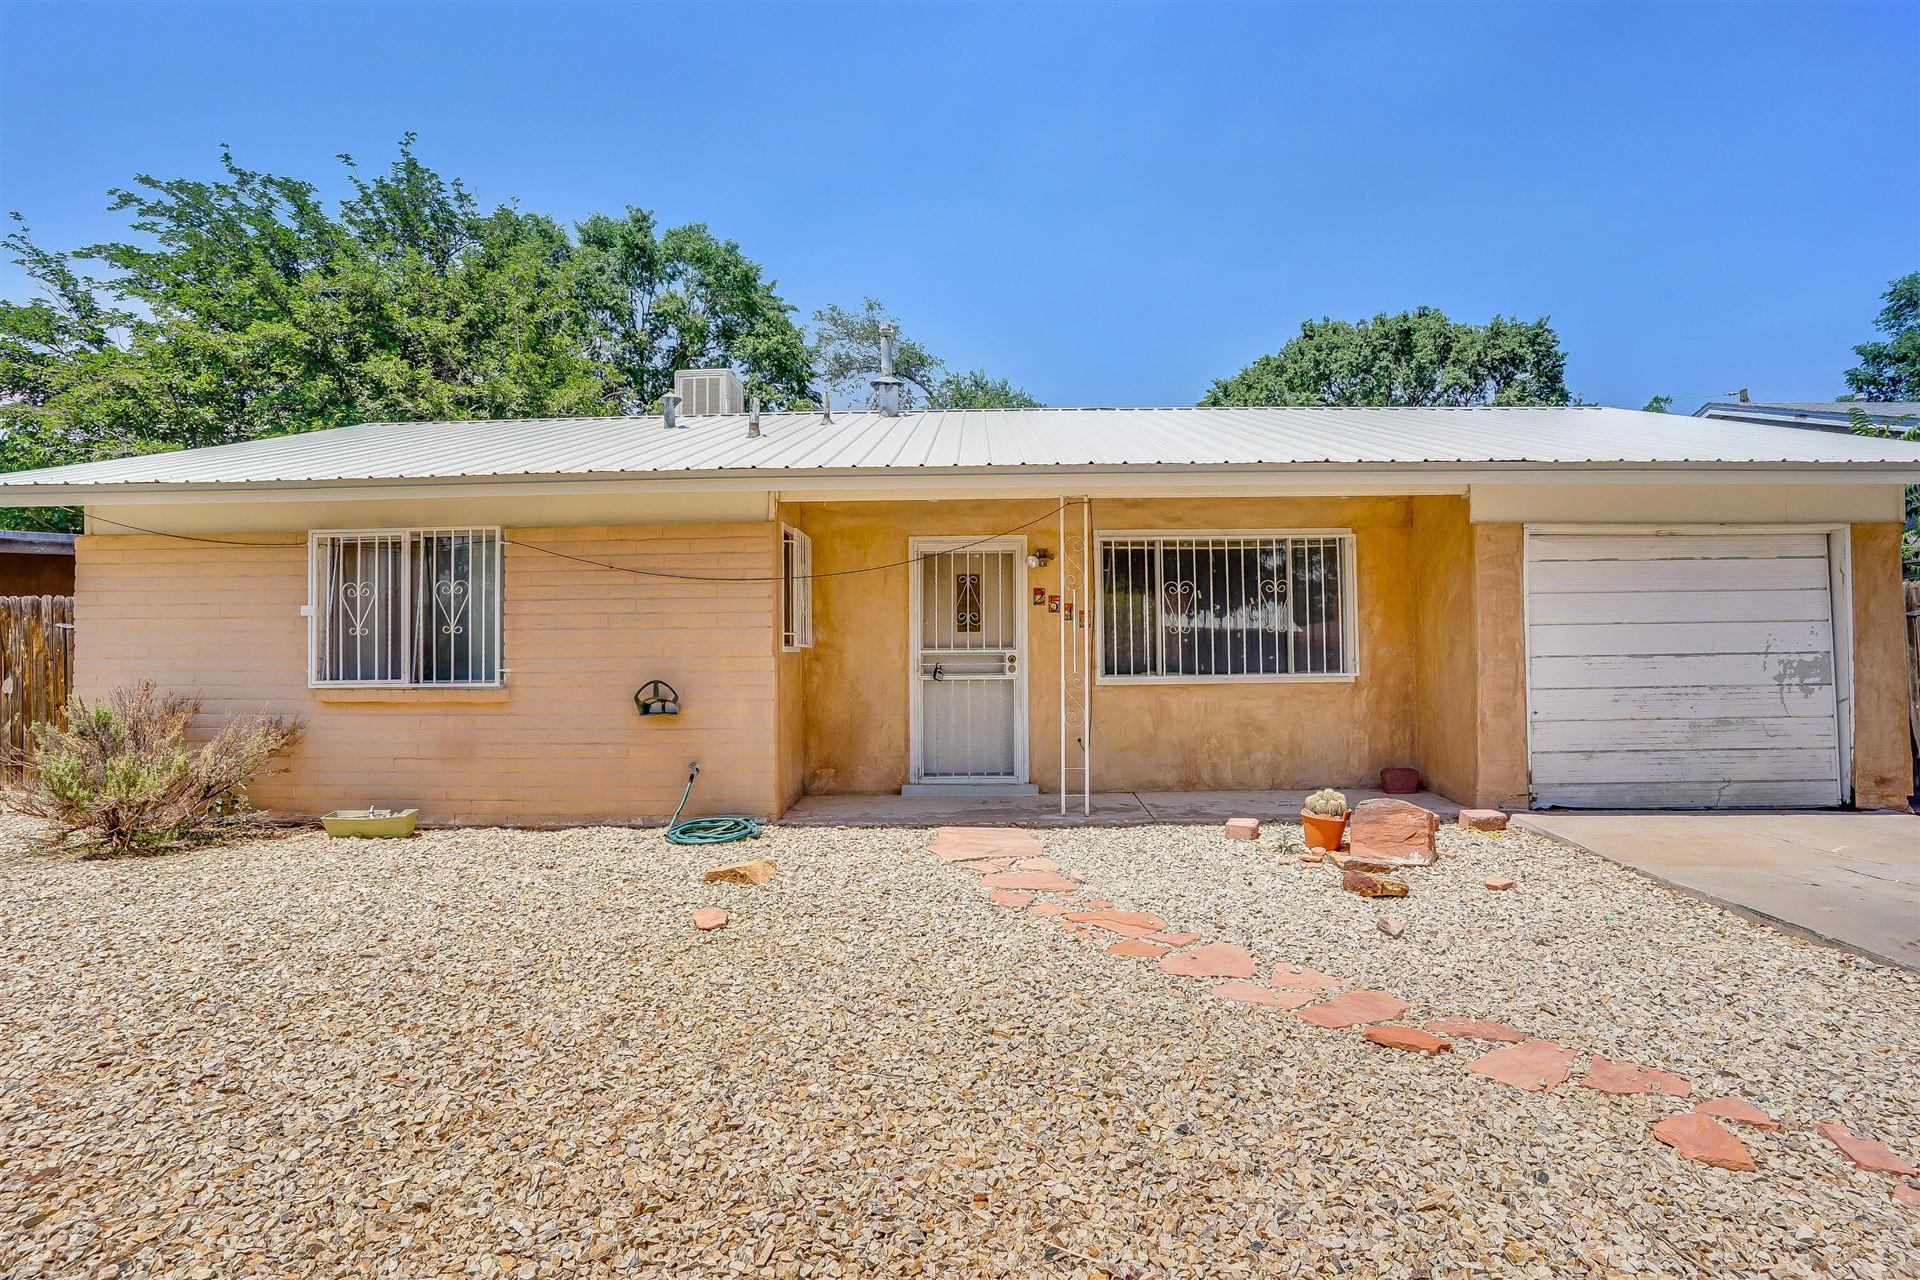 Photo of 2517 Desert Garden Lane SW, Albuquerque, NM 87105 (MLS # 994664)